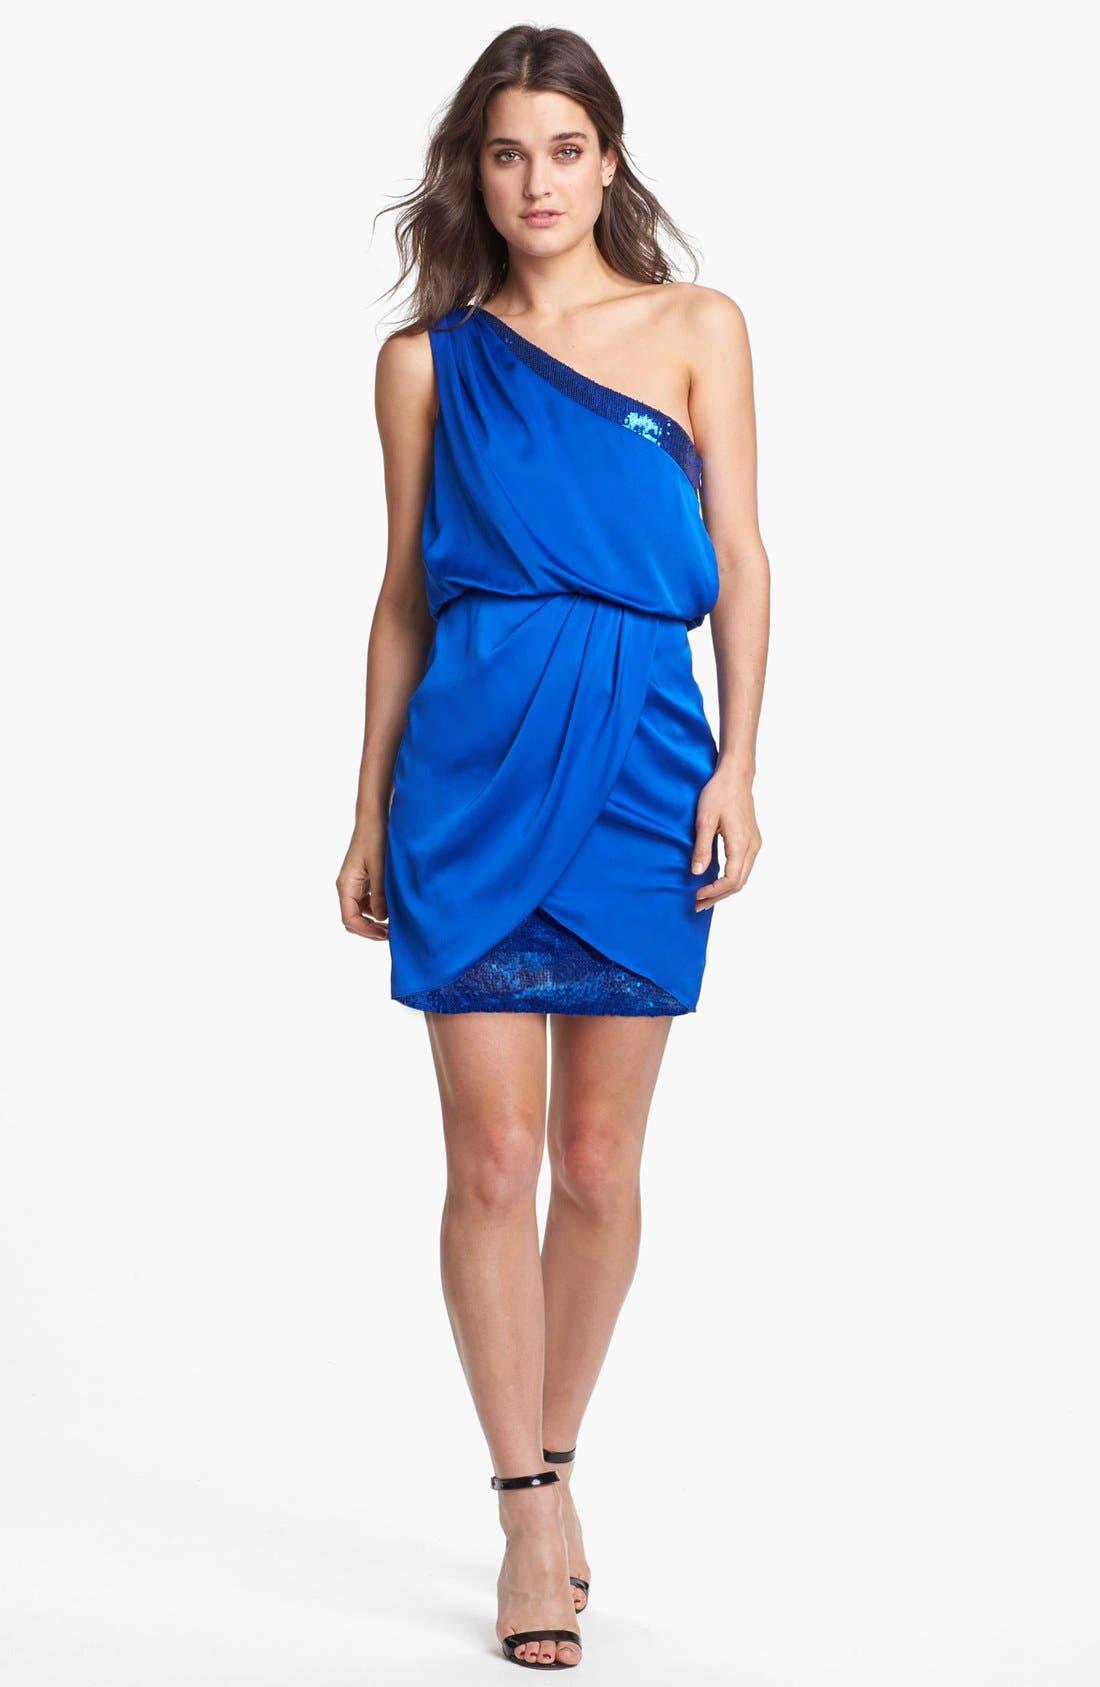 Main Image - Aidan by Aidan Mattox Embellished One-Shoulder Blouson Dress